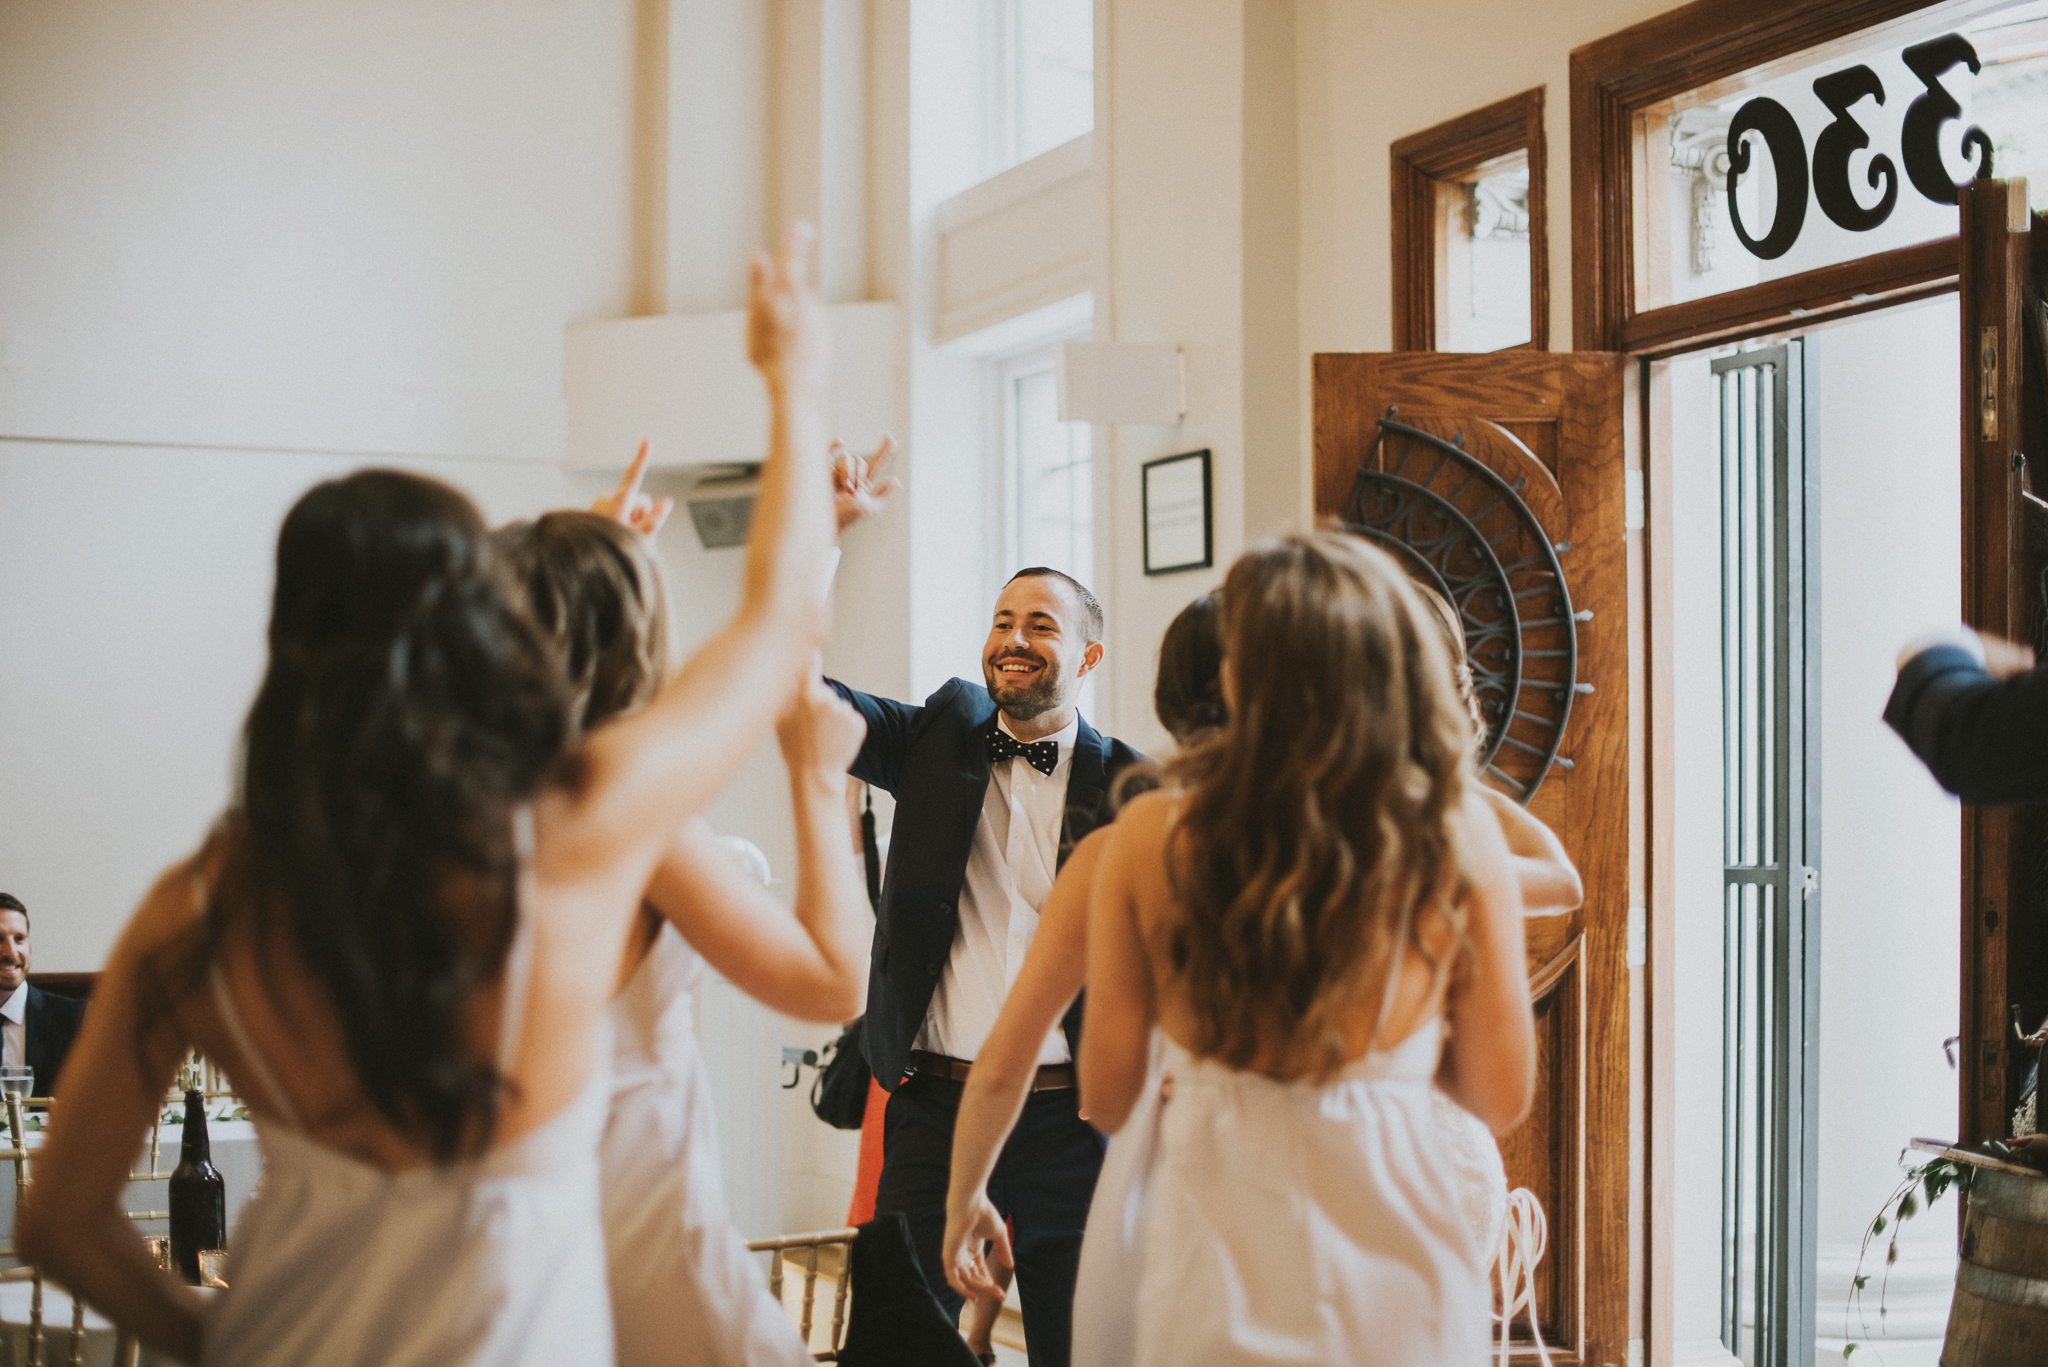 69-permanent-vancouver-wedding-courtneysteven-web-9075.jpg